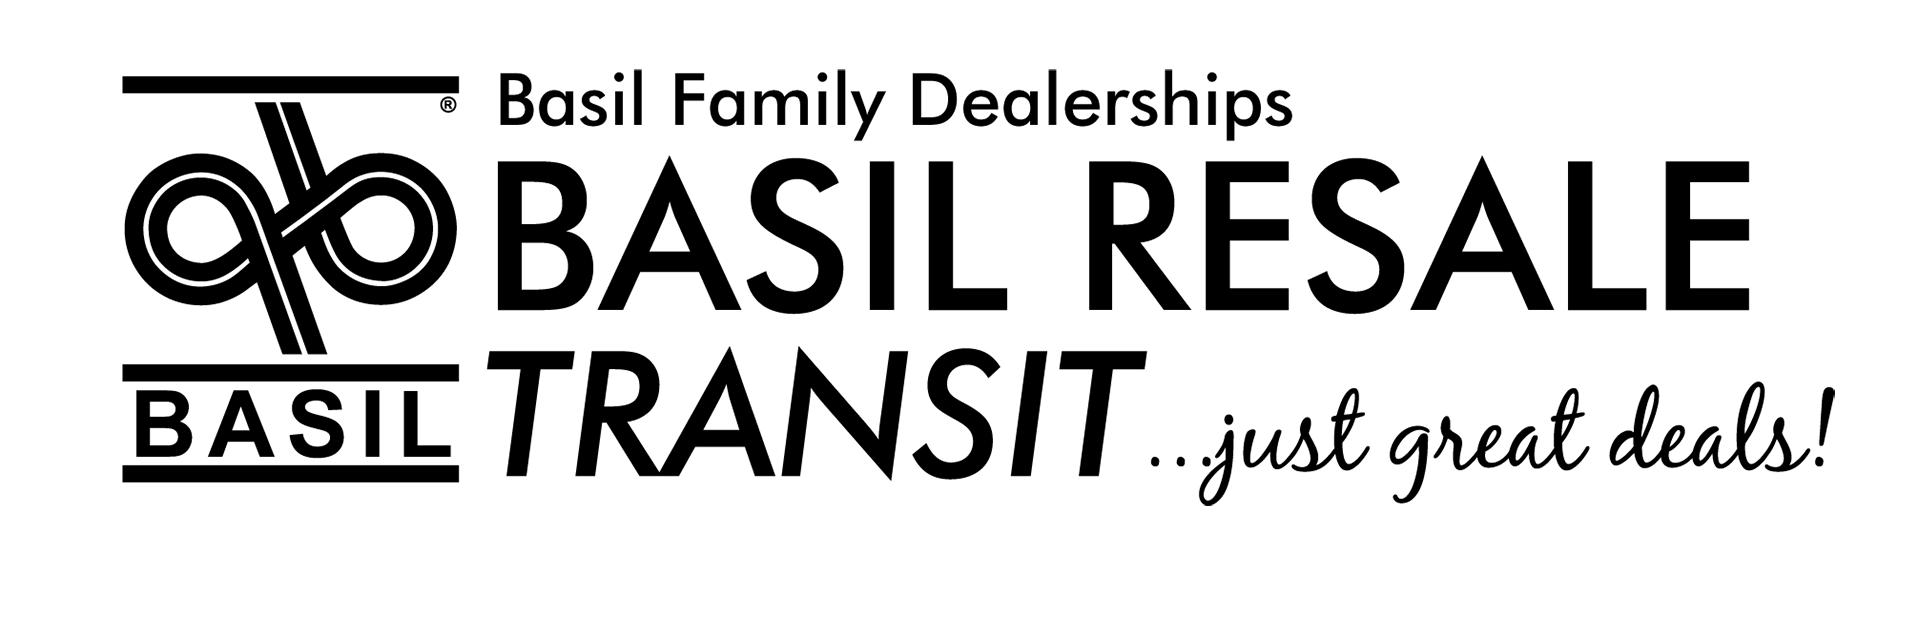 bret-black